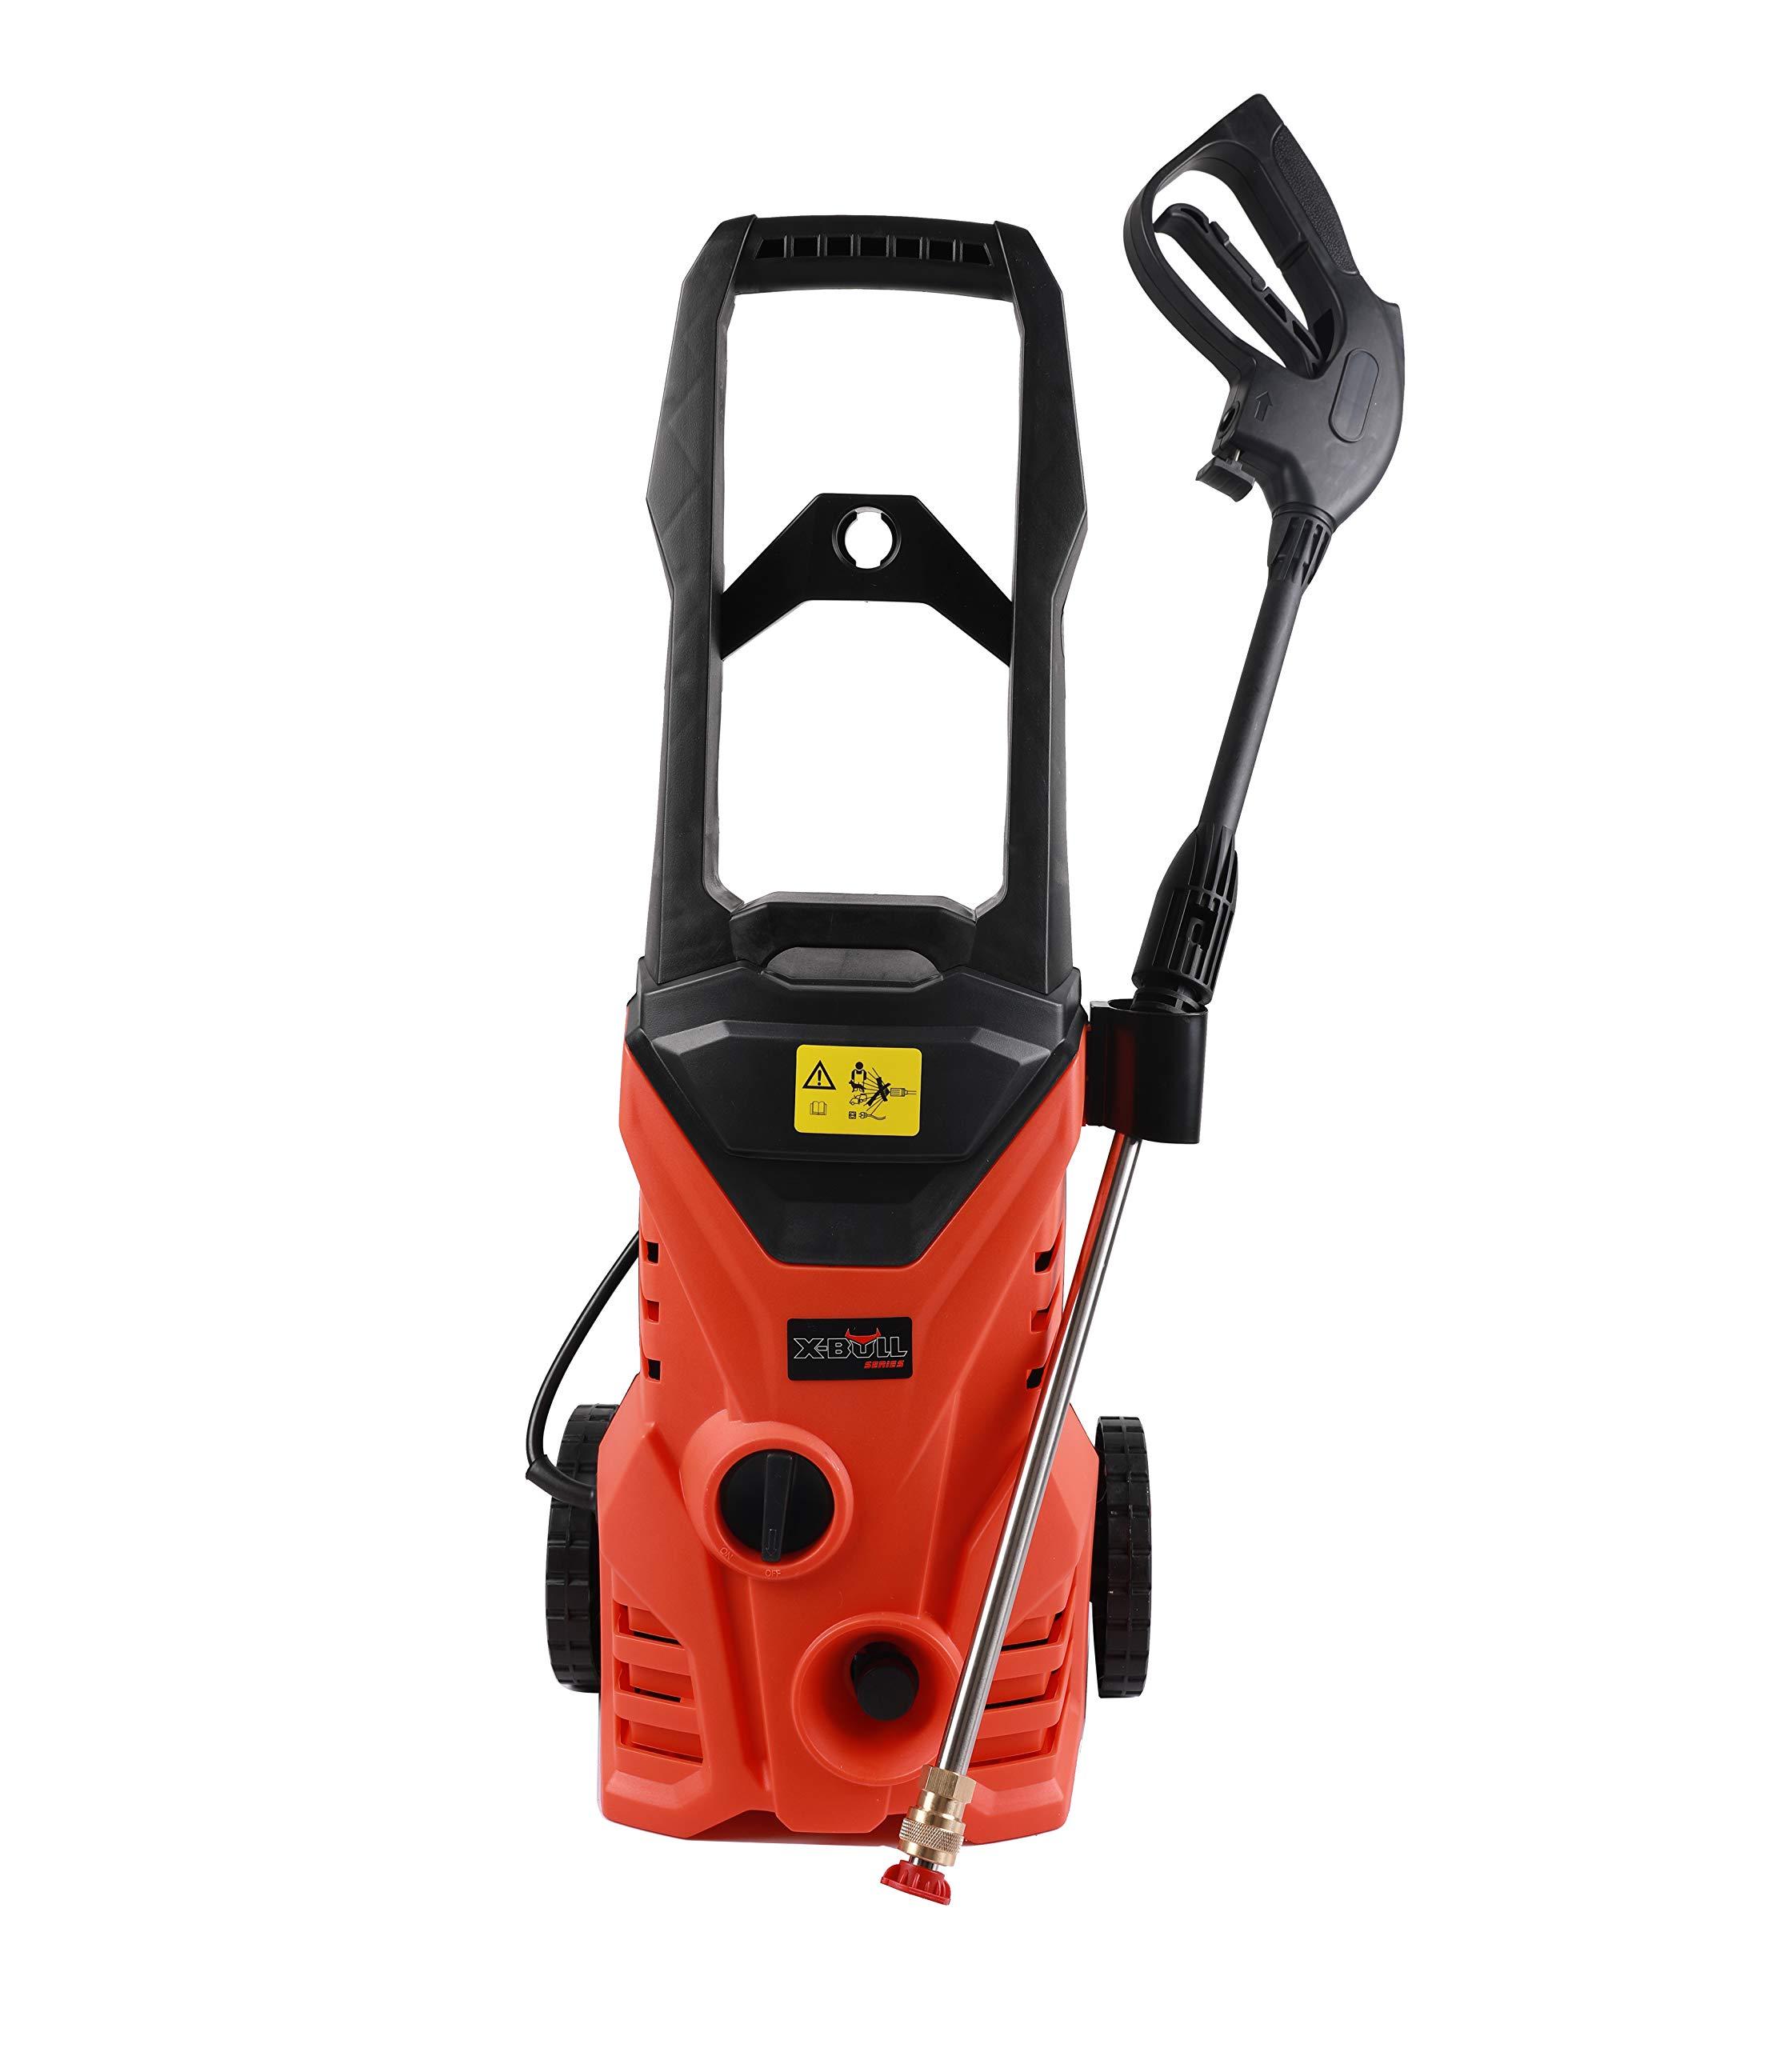 X-BULL Pressure Washer 2500PSI 1.8GPM Electric Power Washer Orange